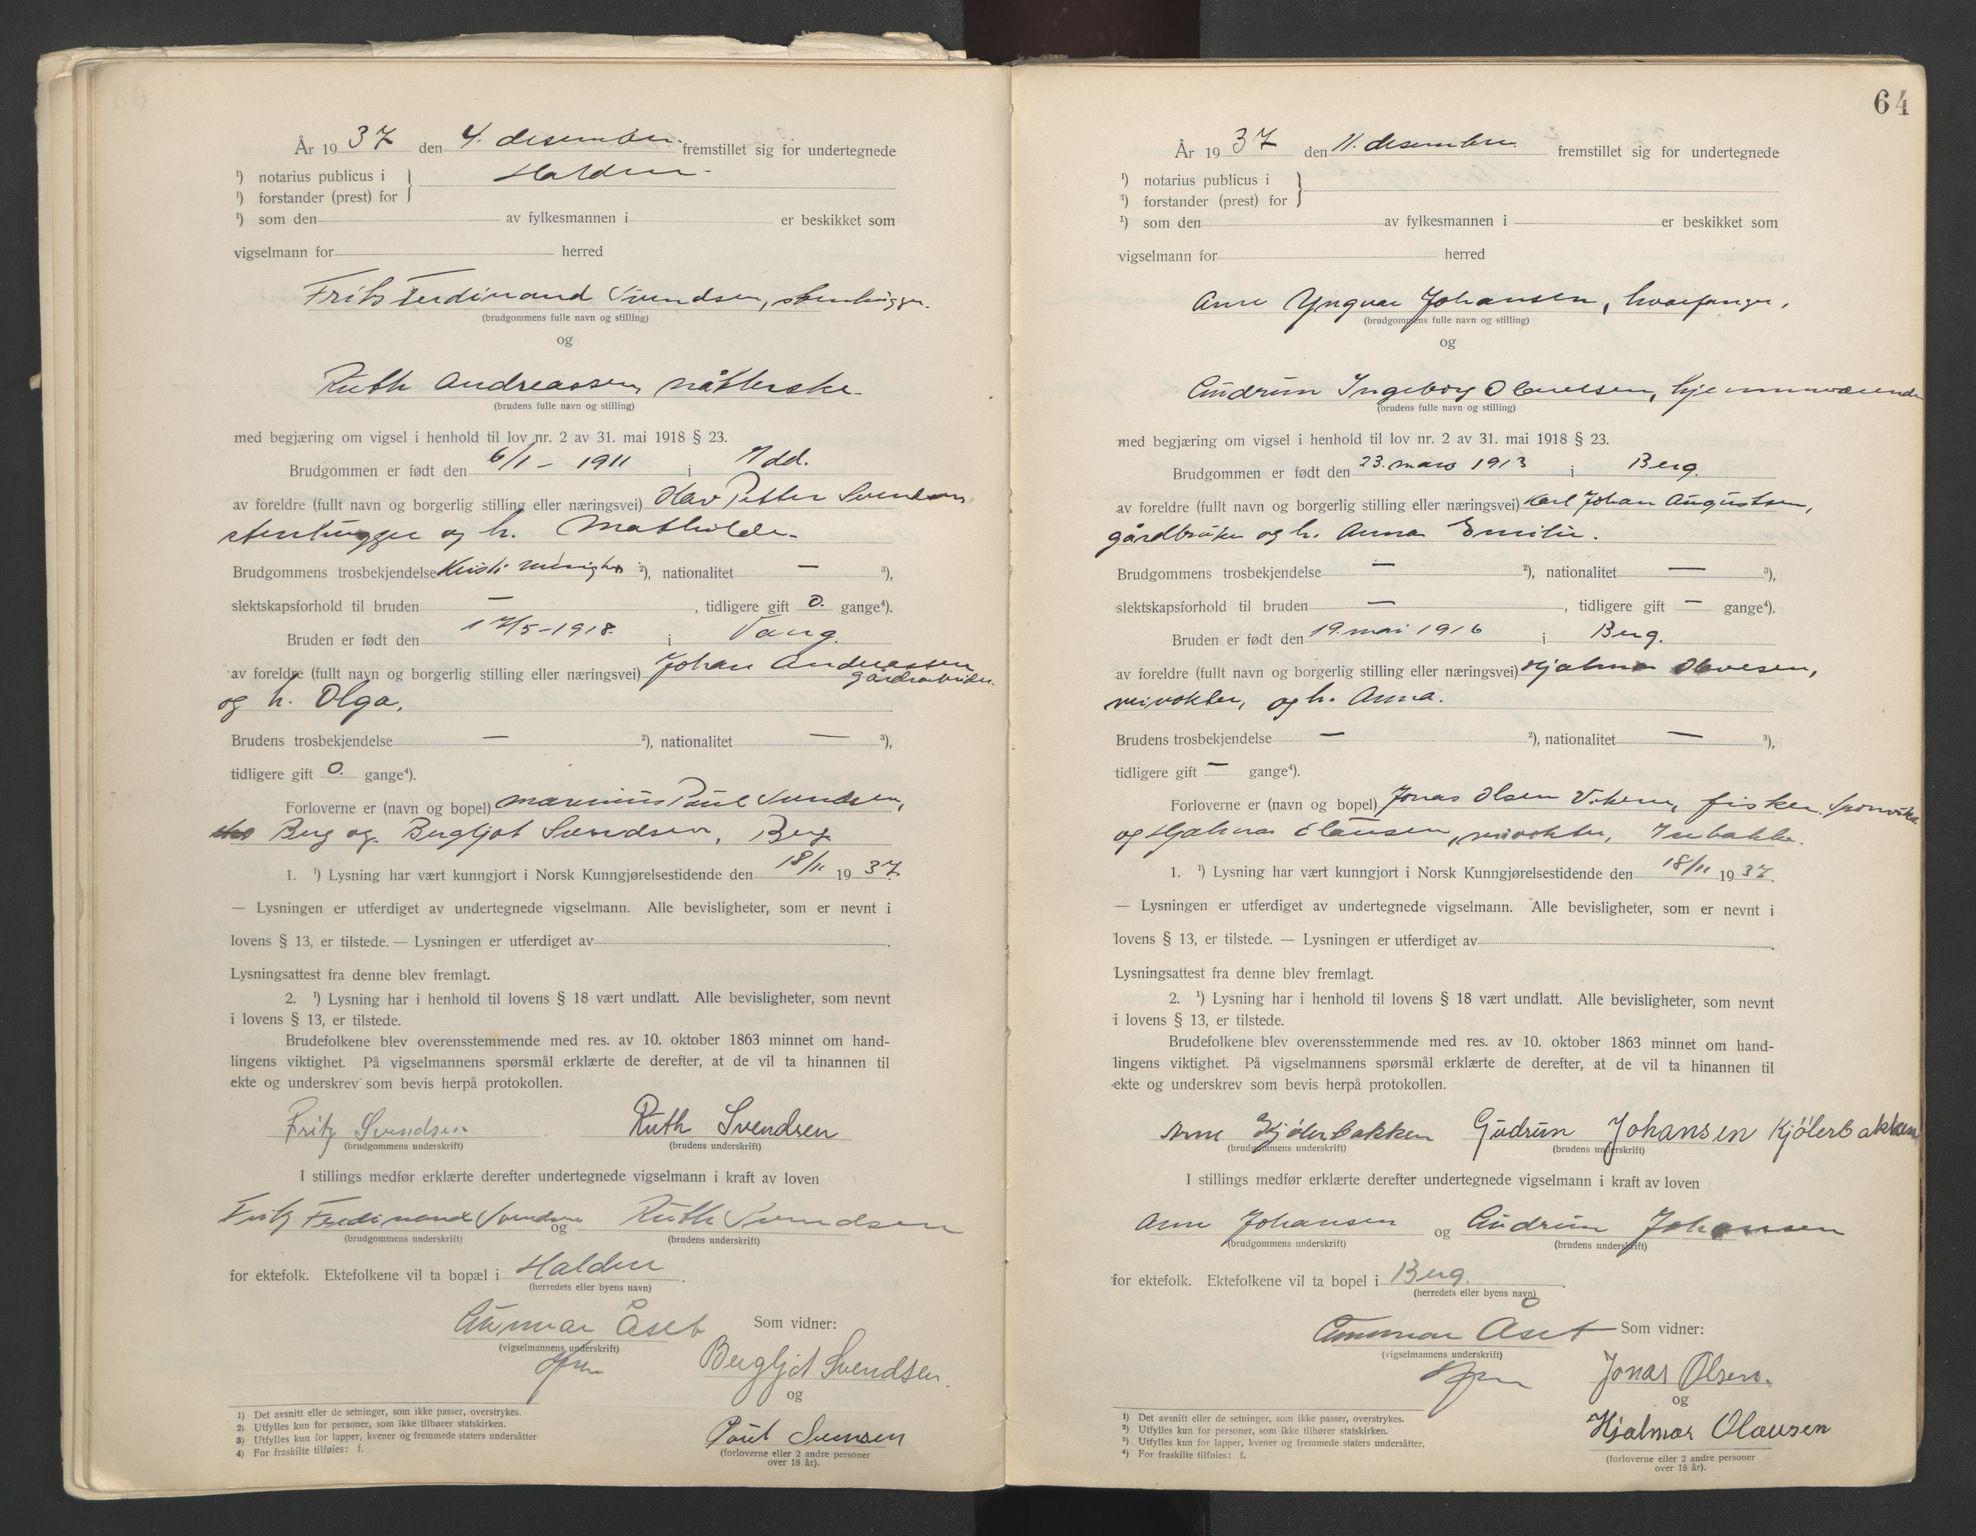 SAO, Idd og Marker sorenskriveri, L/Lc/L0001: Vigselsbøker, 1920-1942, s. 64